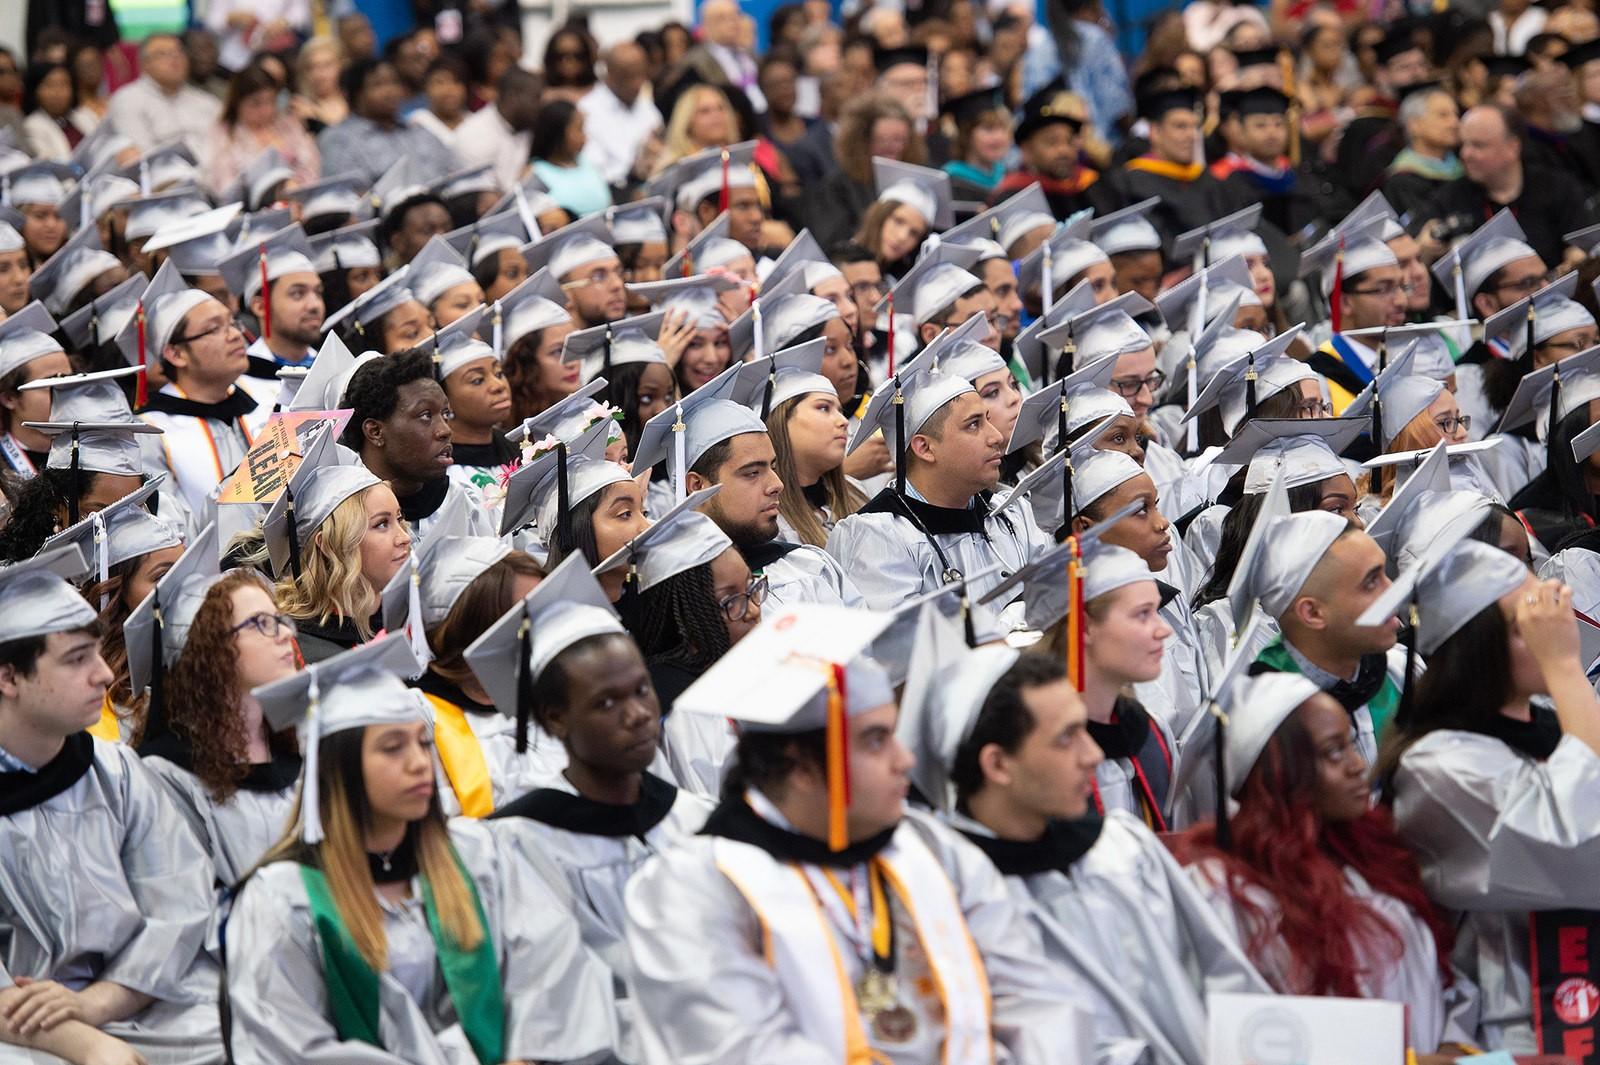 Union County College | LinkedIn